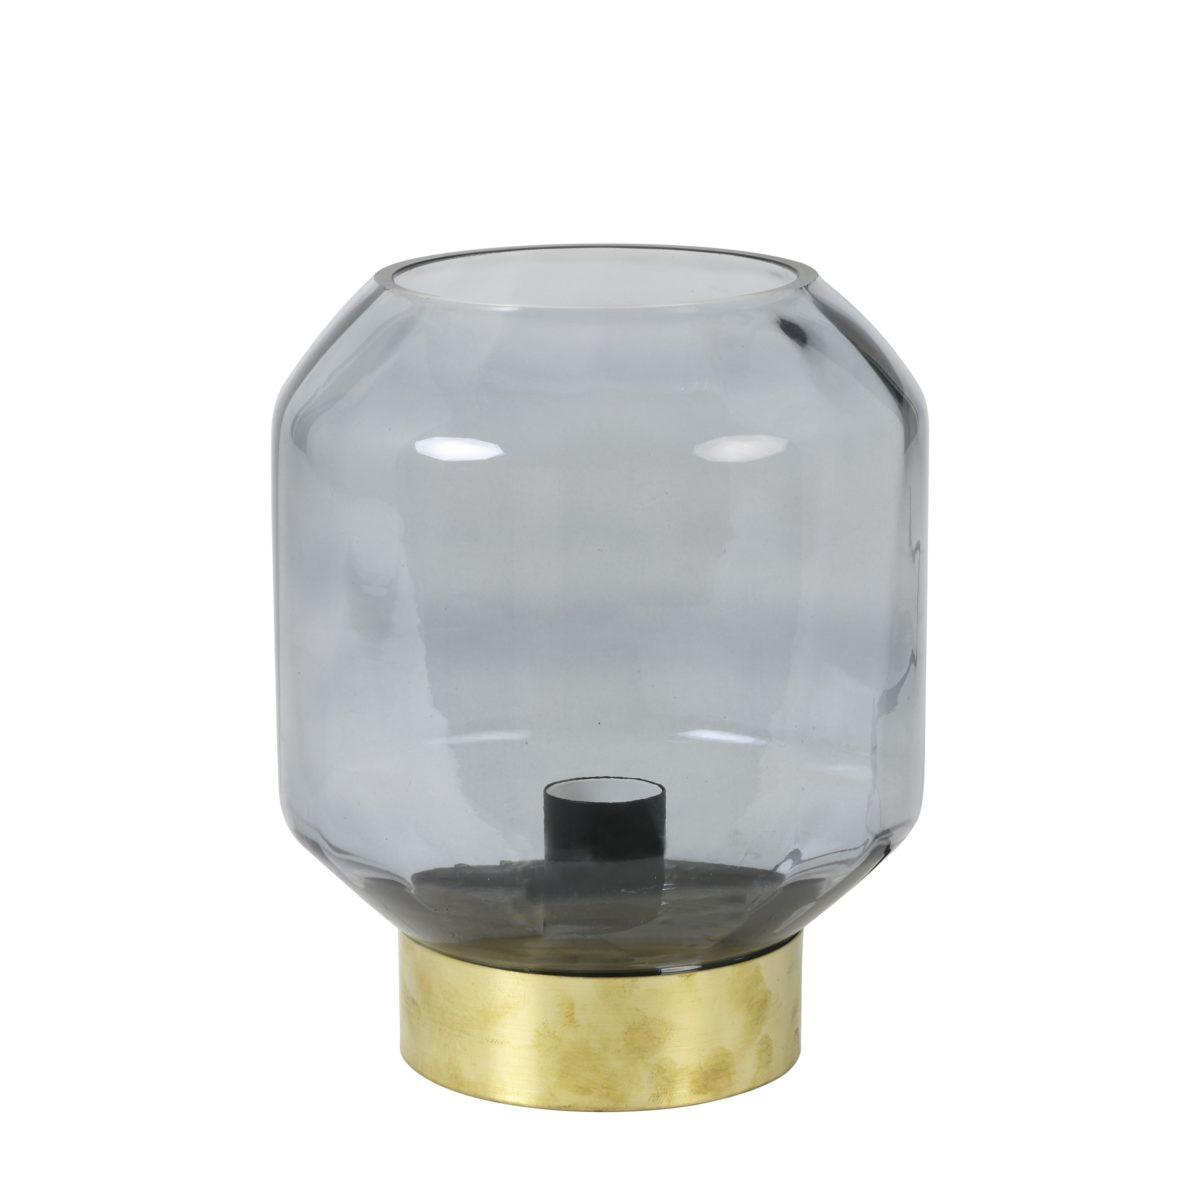 lamp, tafel, chroom, goud, glas, rookglas